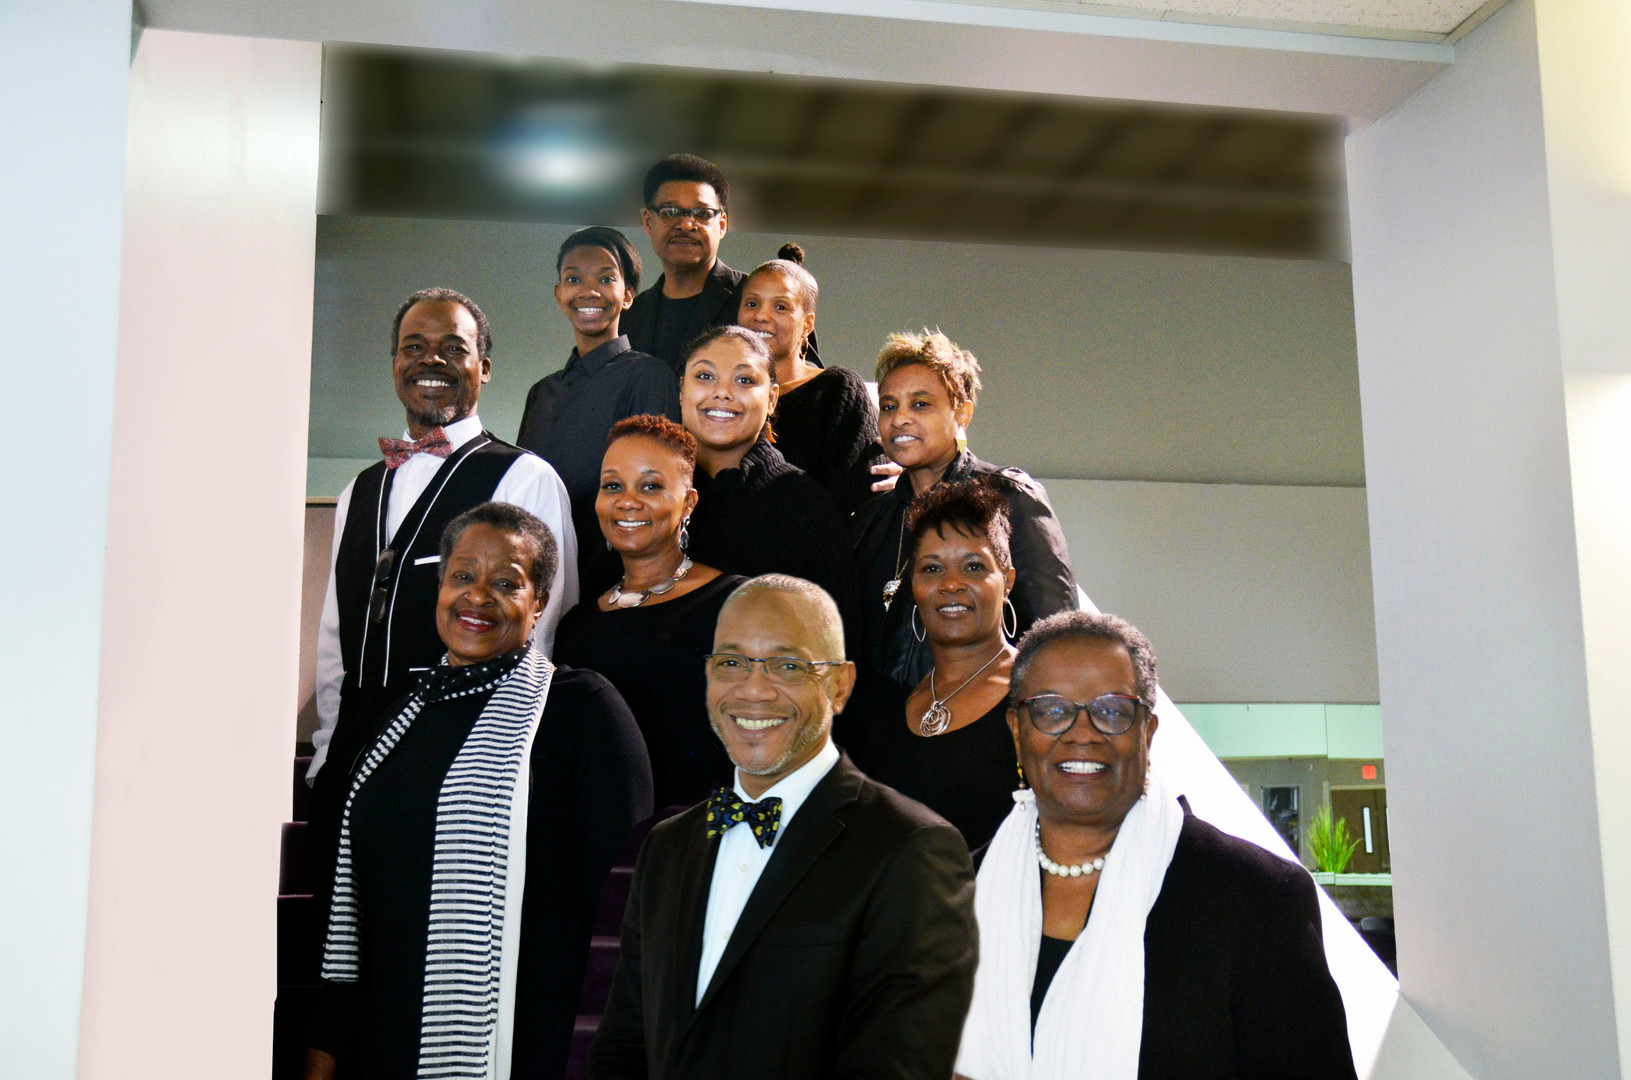 Pastors_Ministers3_Nov 2019.jpg